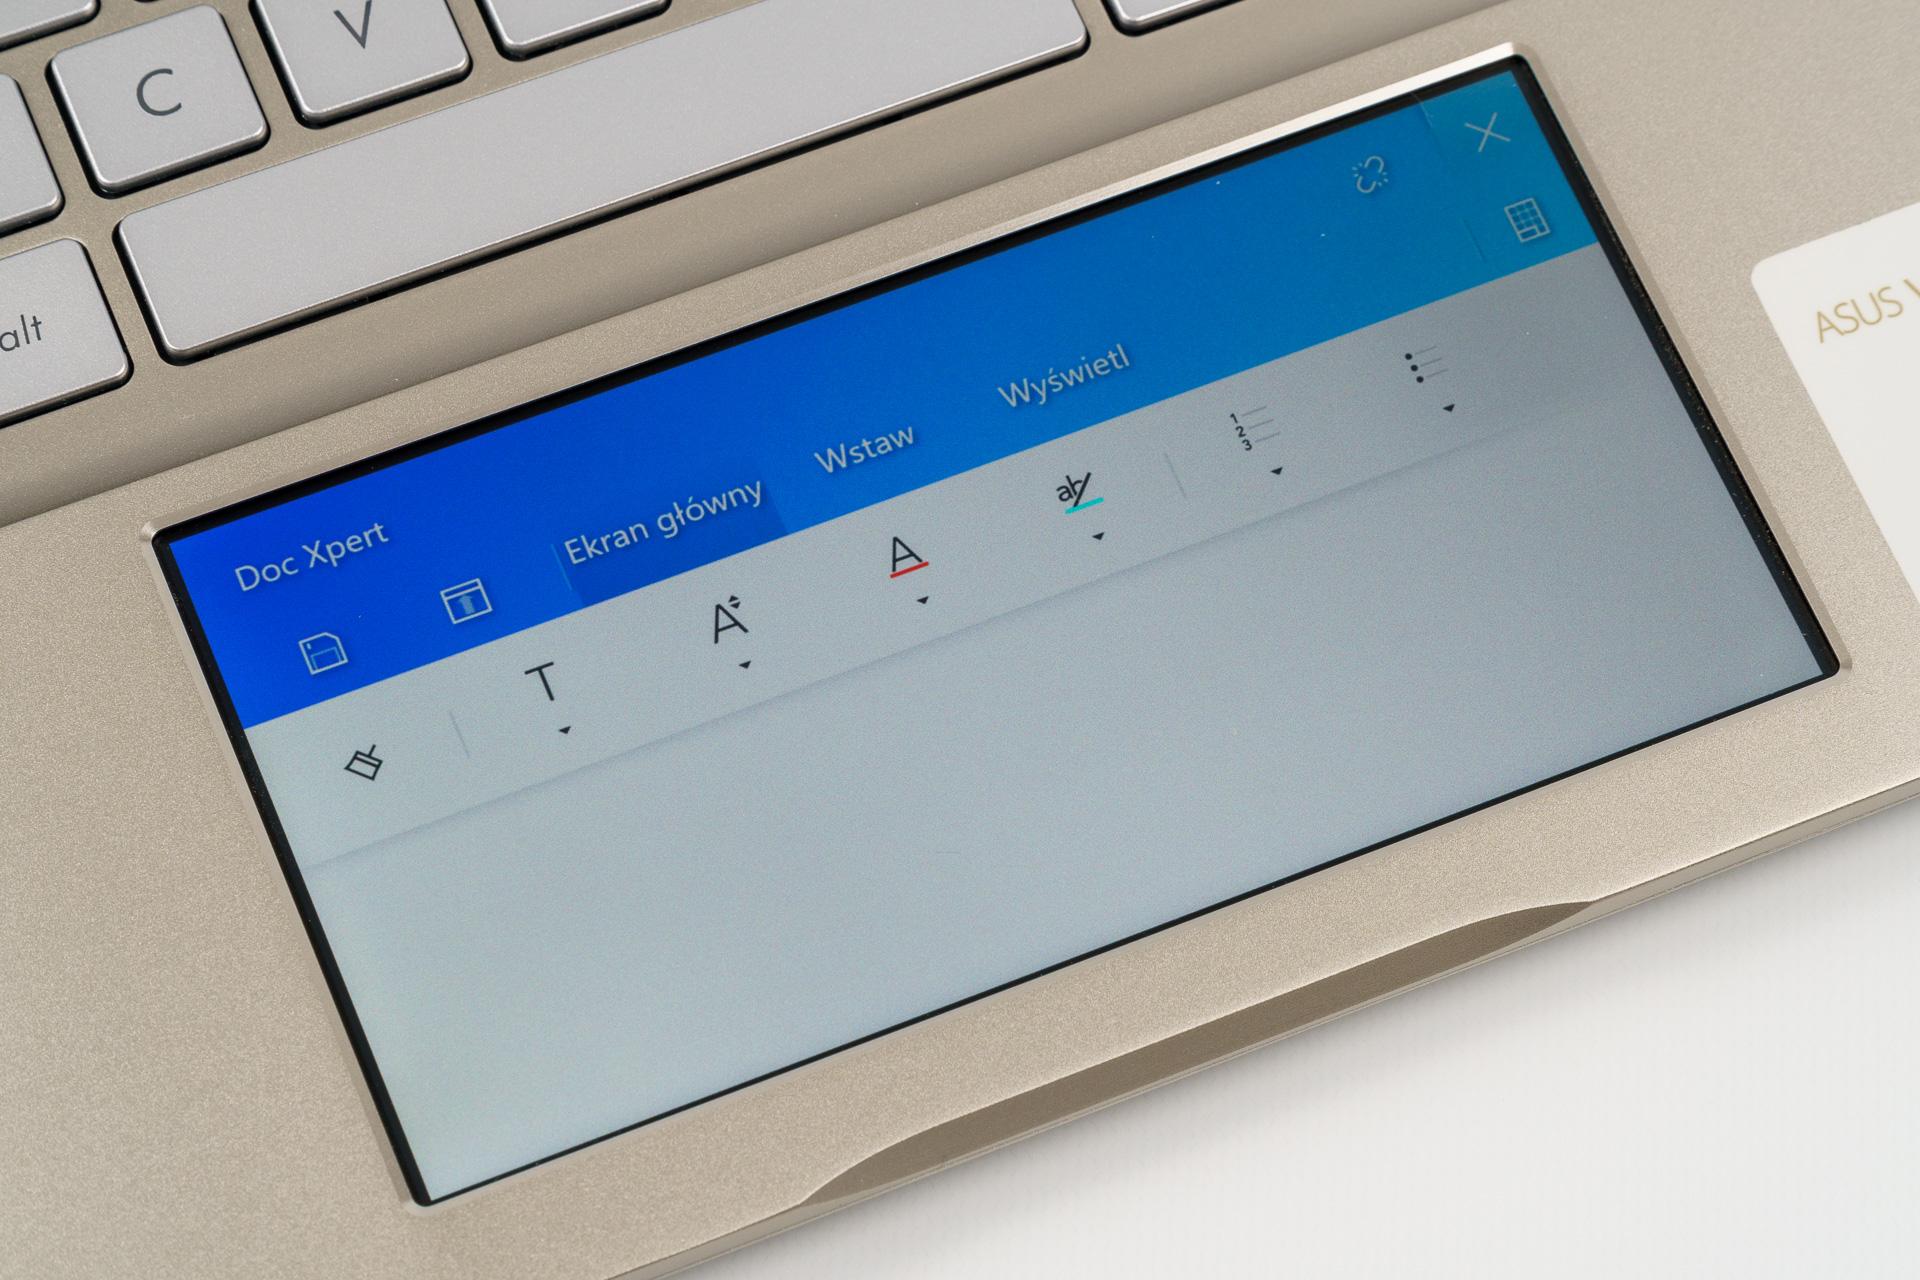 Asus VivoBook ze ScreenPadem, czyli po co w notebooku drugi ekran? 24